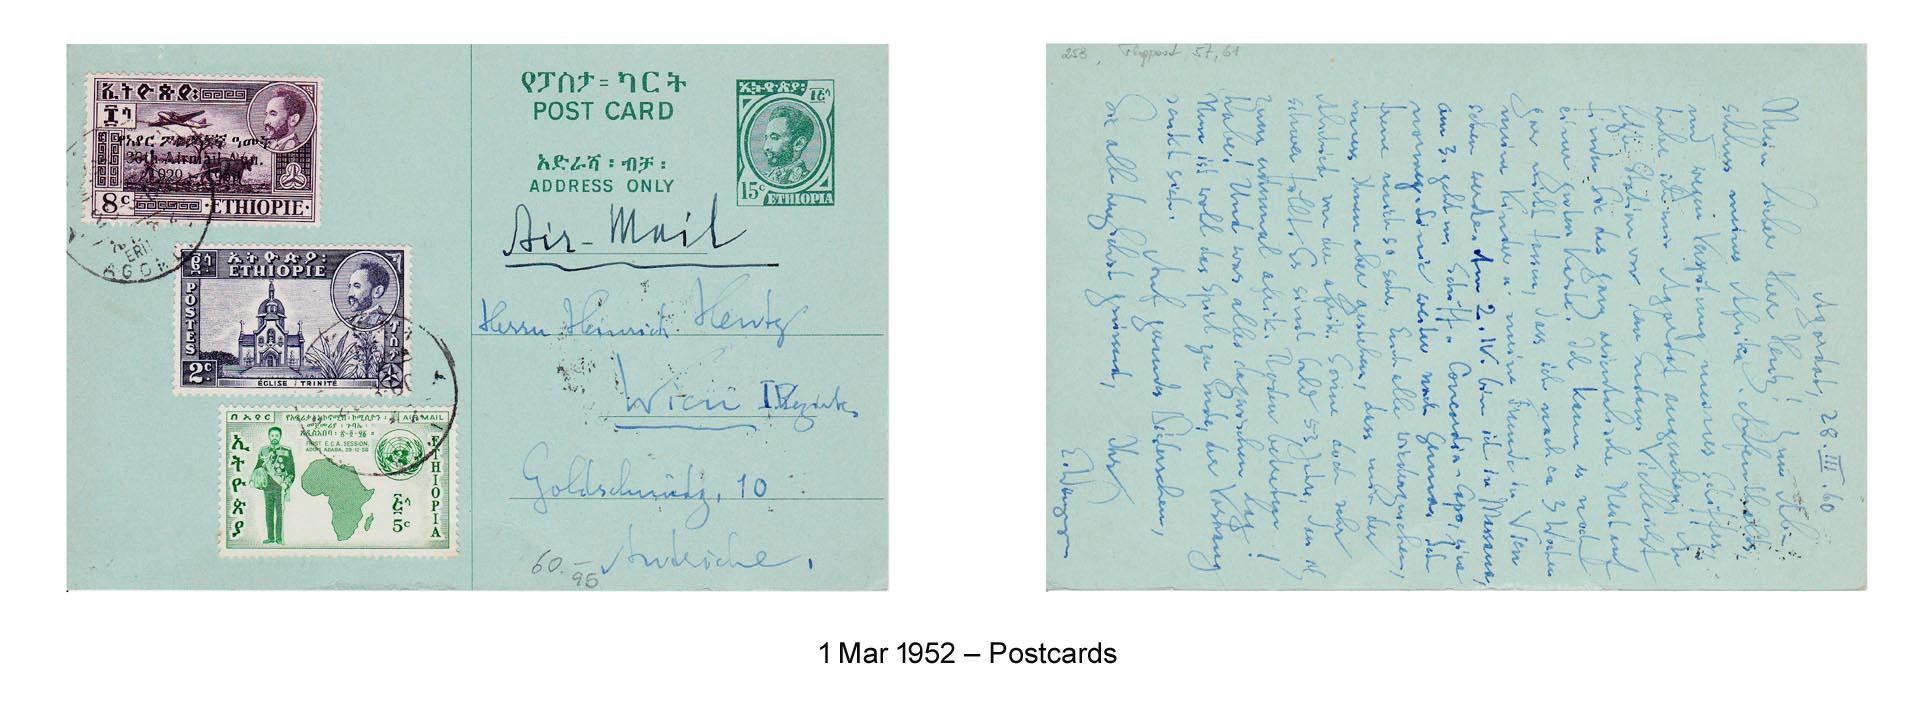 19520301 – Postcards